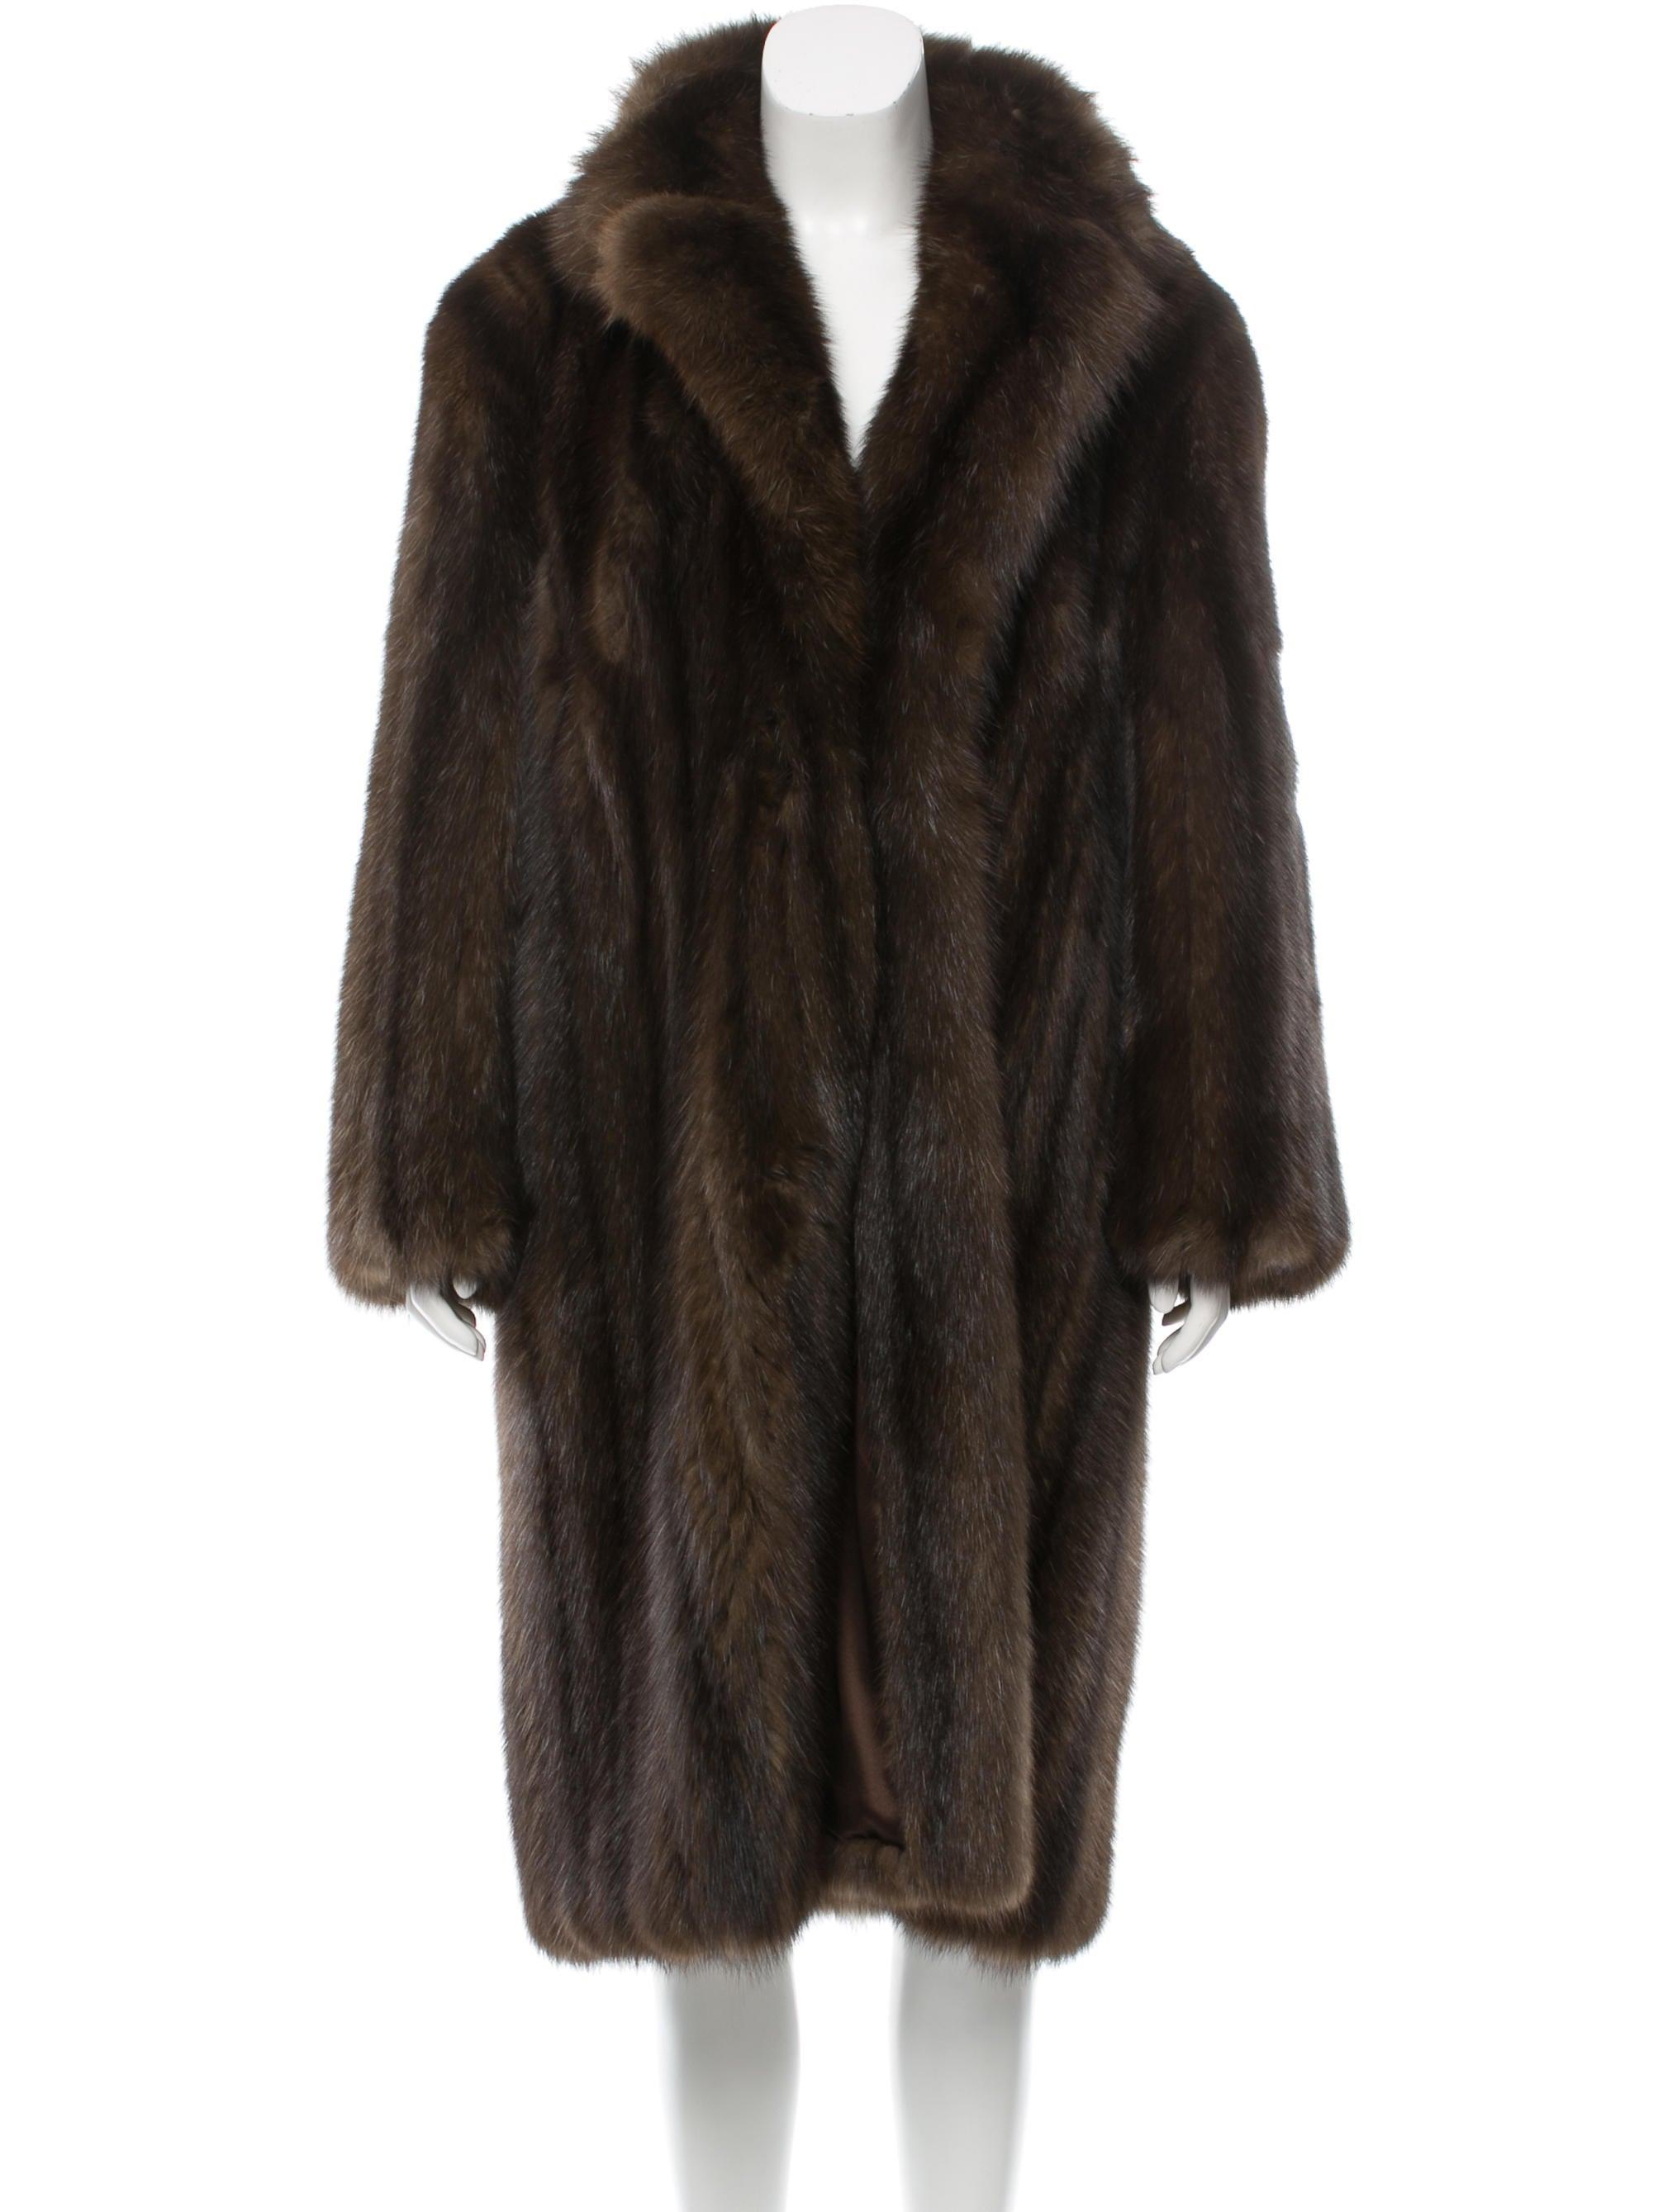 Michael Kors Long Sable Fur Coat Clothing Mic46519